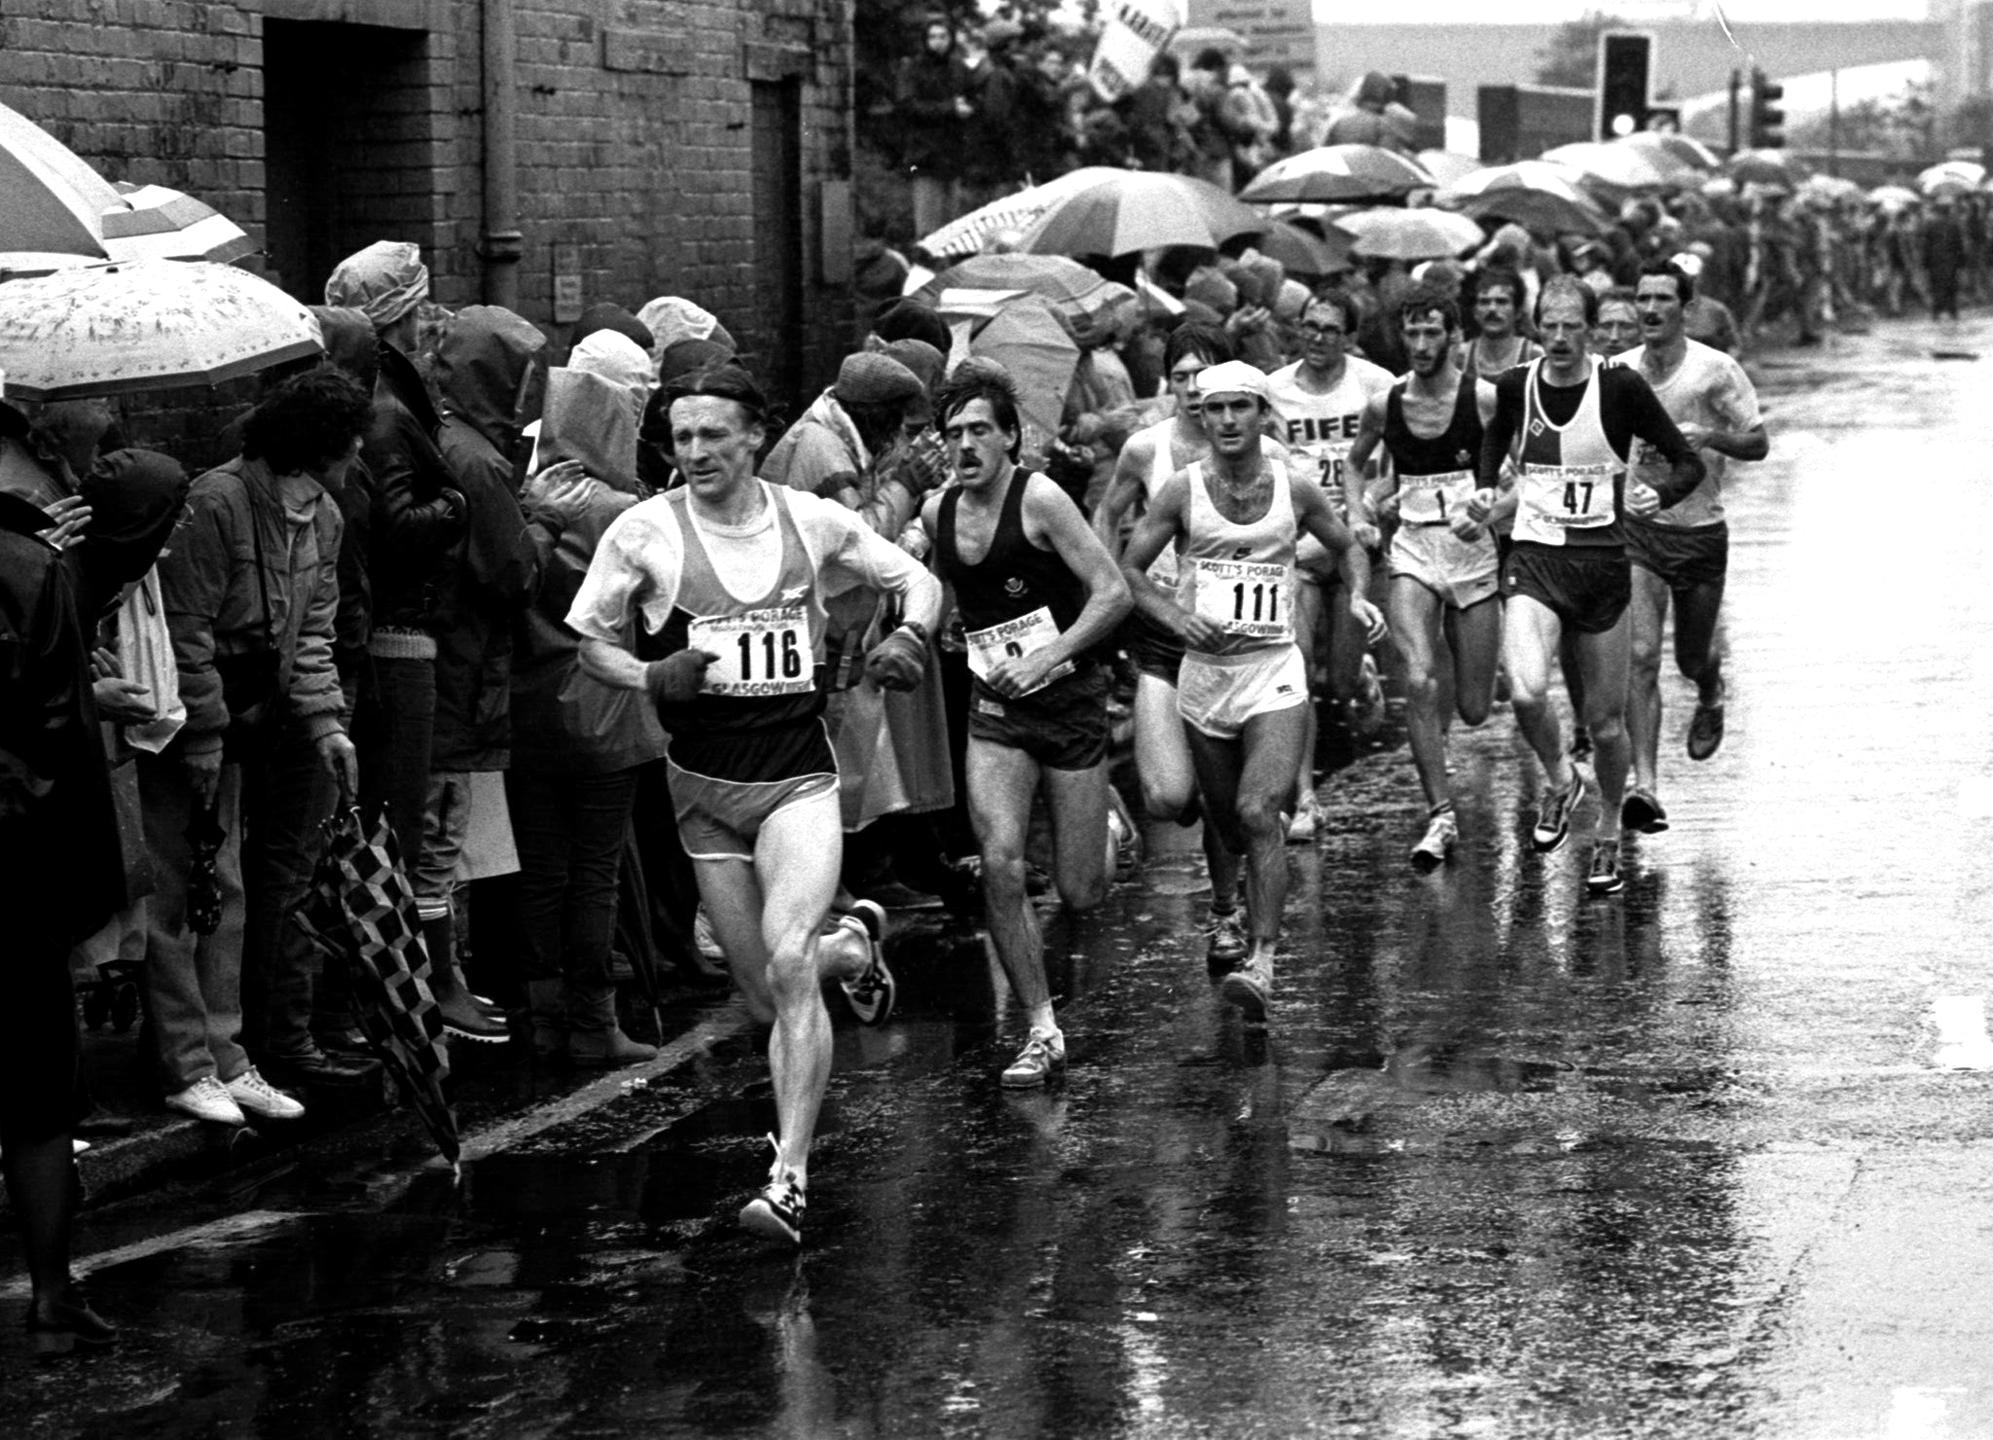 Glasgow Marathon 1985 - The Scots..